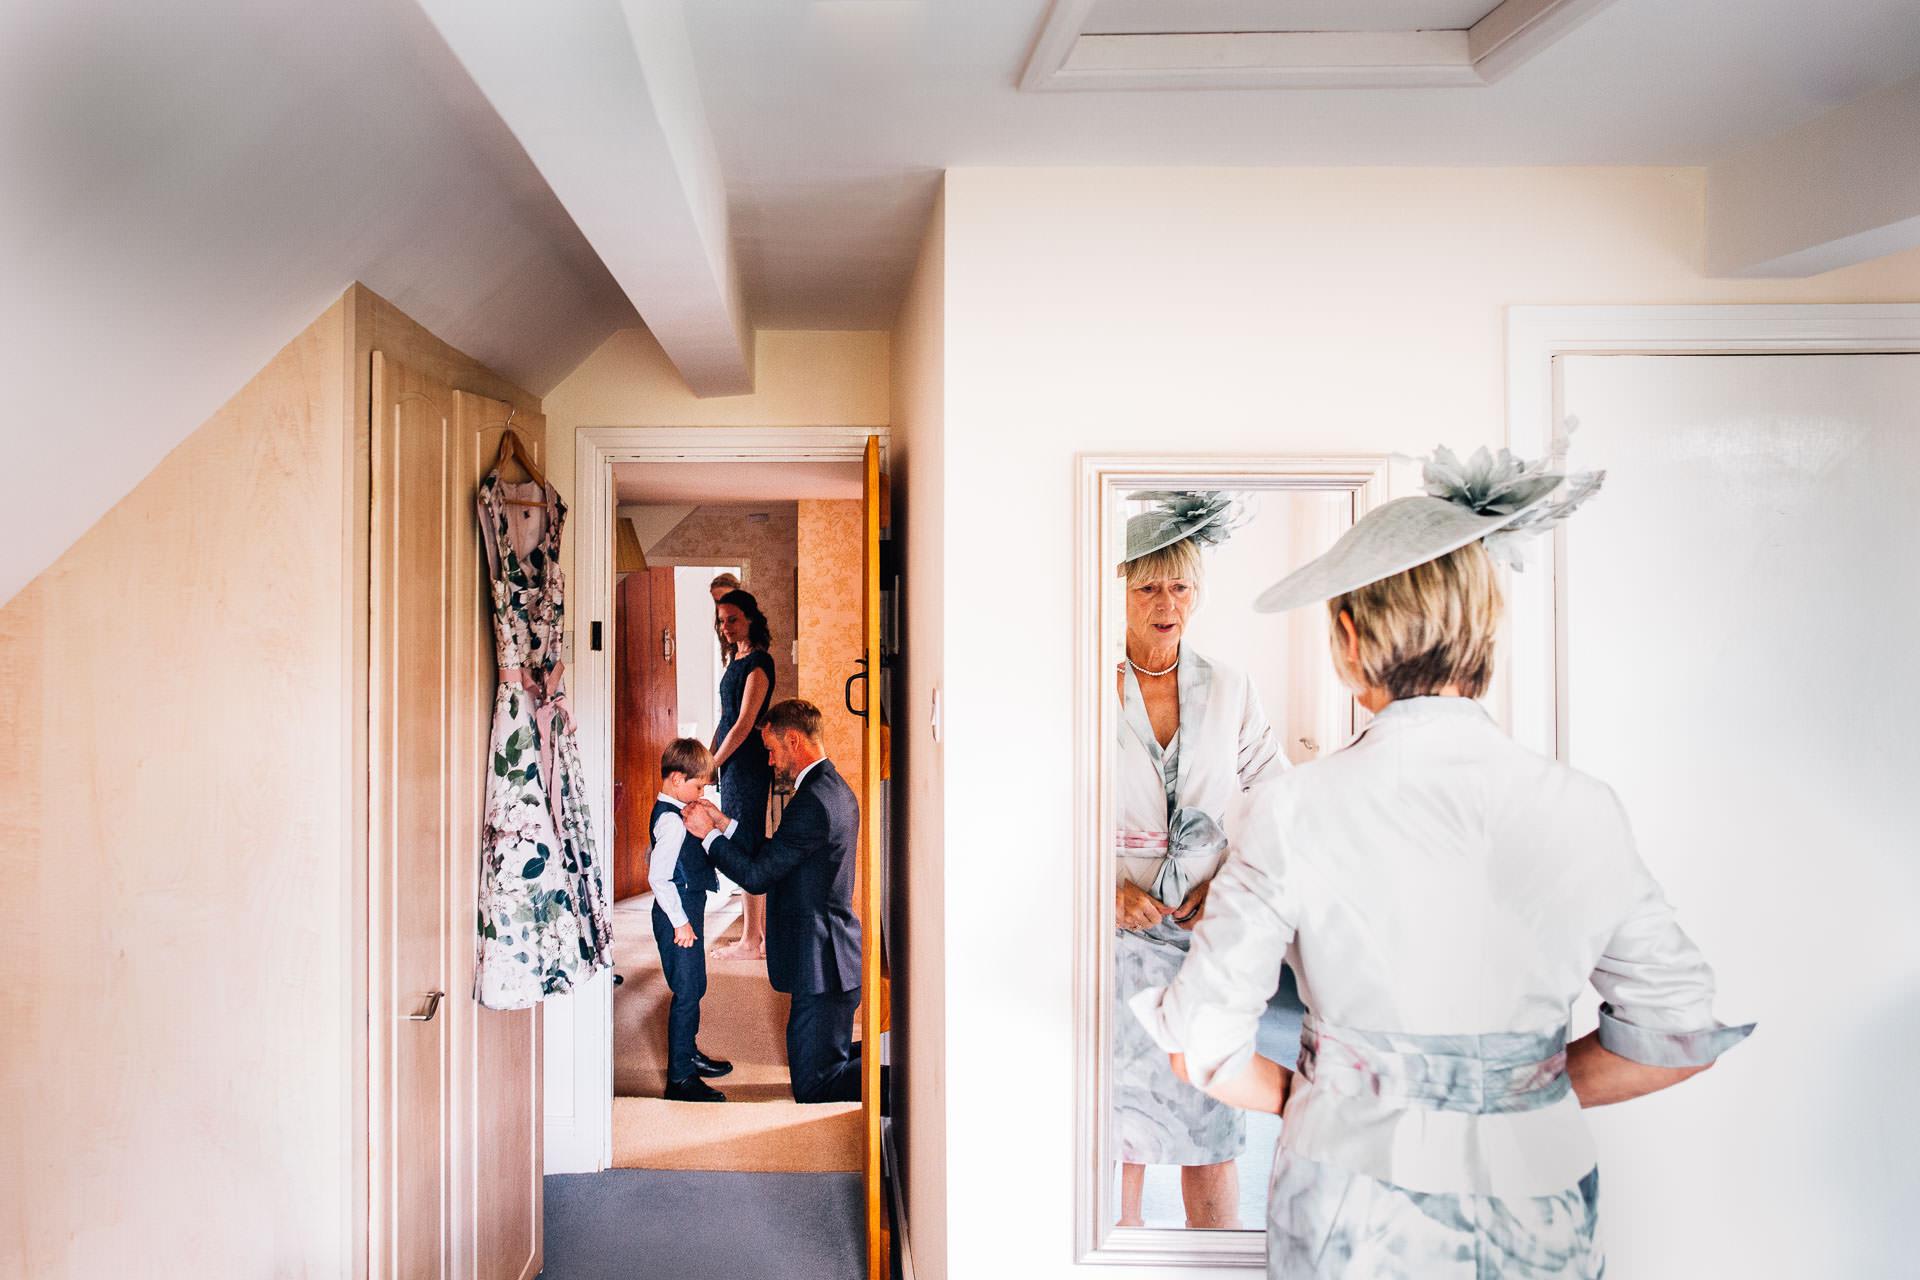 winterbourne-medieval-barn-wedding-photography-emma-andrew-19